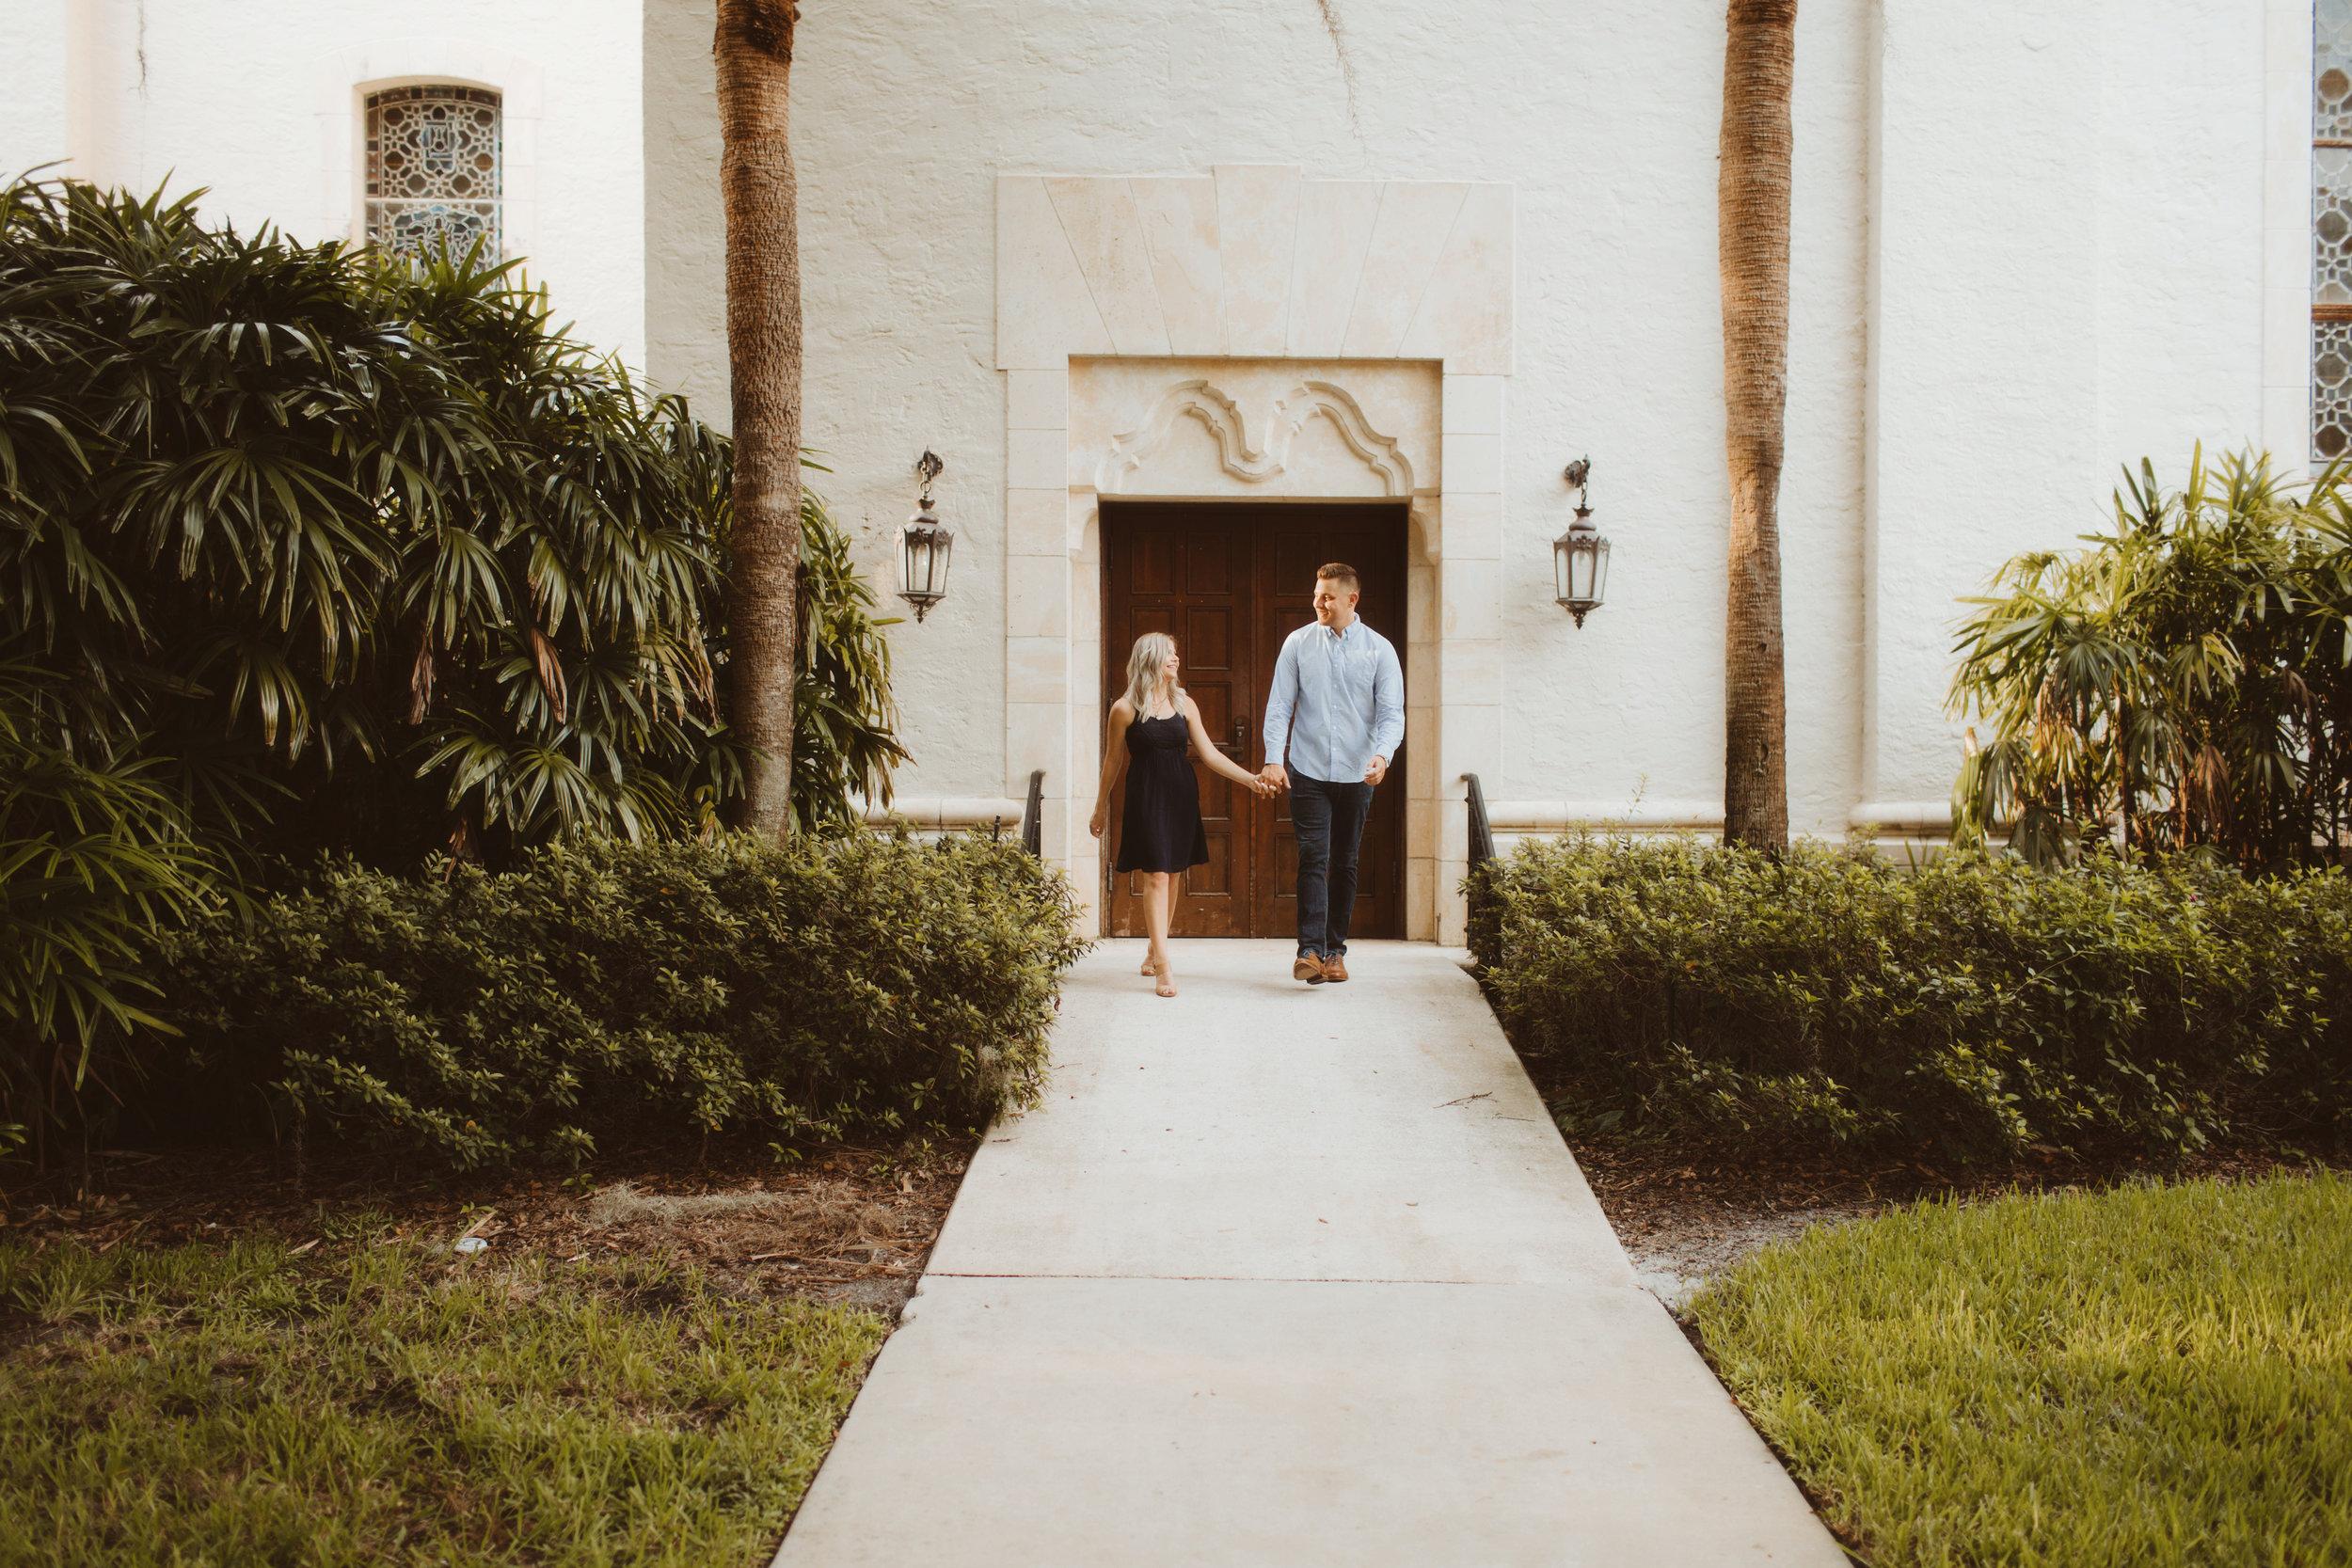 Engagement | Vanessa Boy Photography | vanessaboy.com |-19-2.com |final .jpg